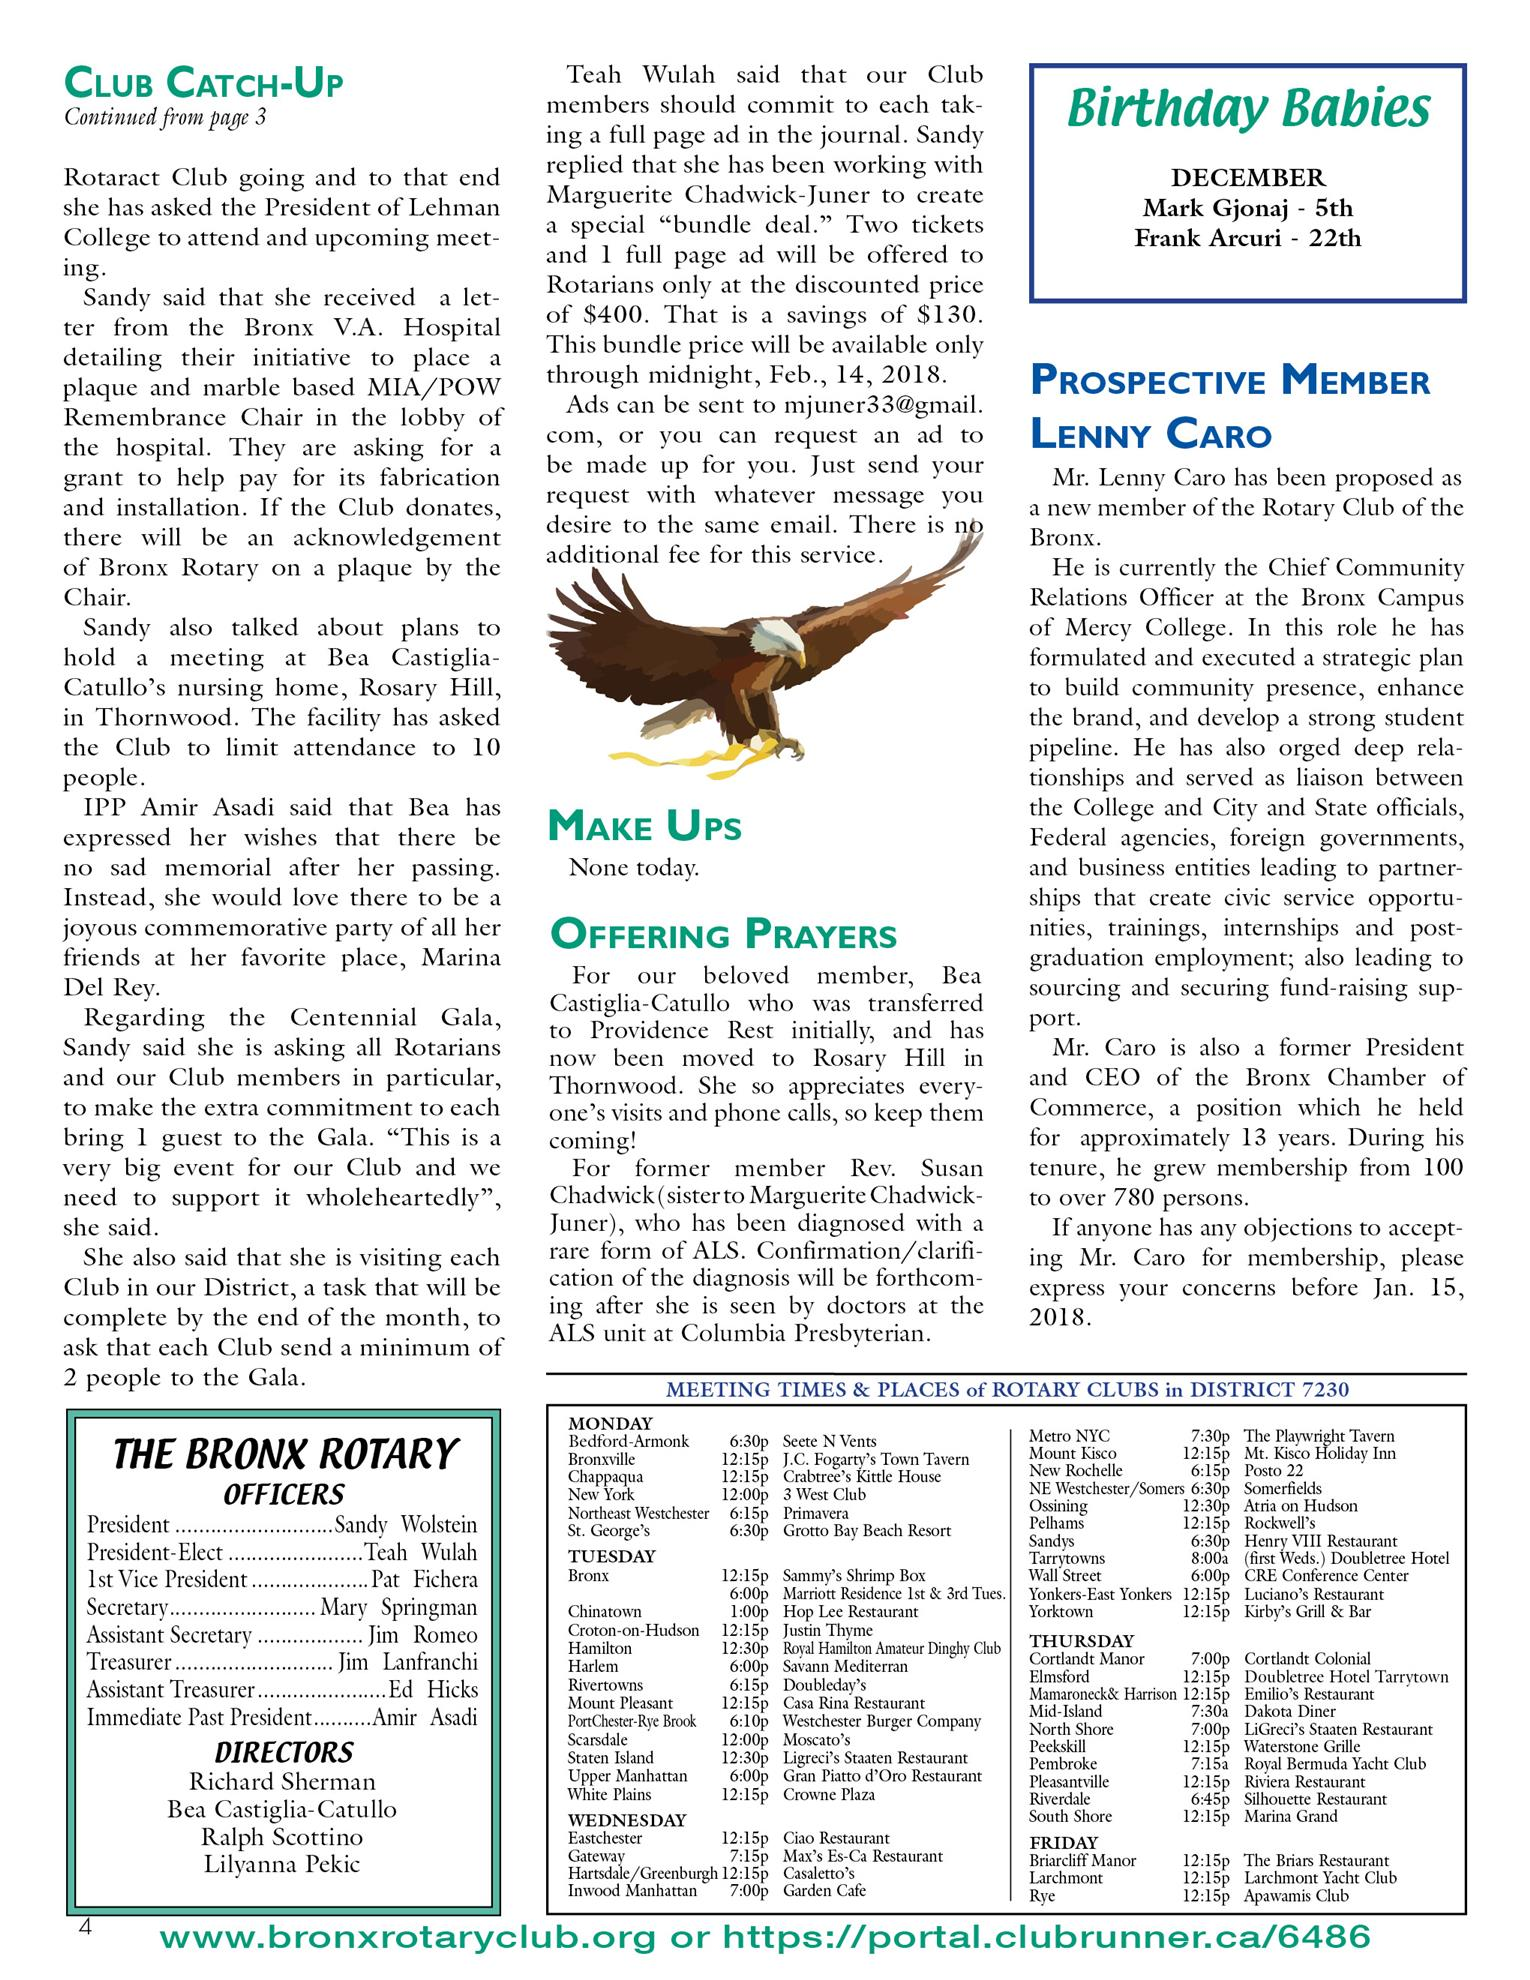 Tuesdays Newsletter 12/19 & 12/26/17 & 1/9/18 p4